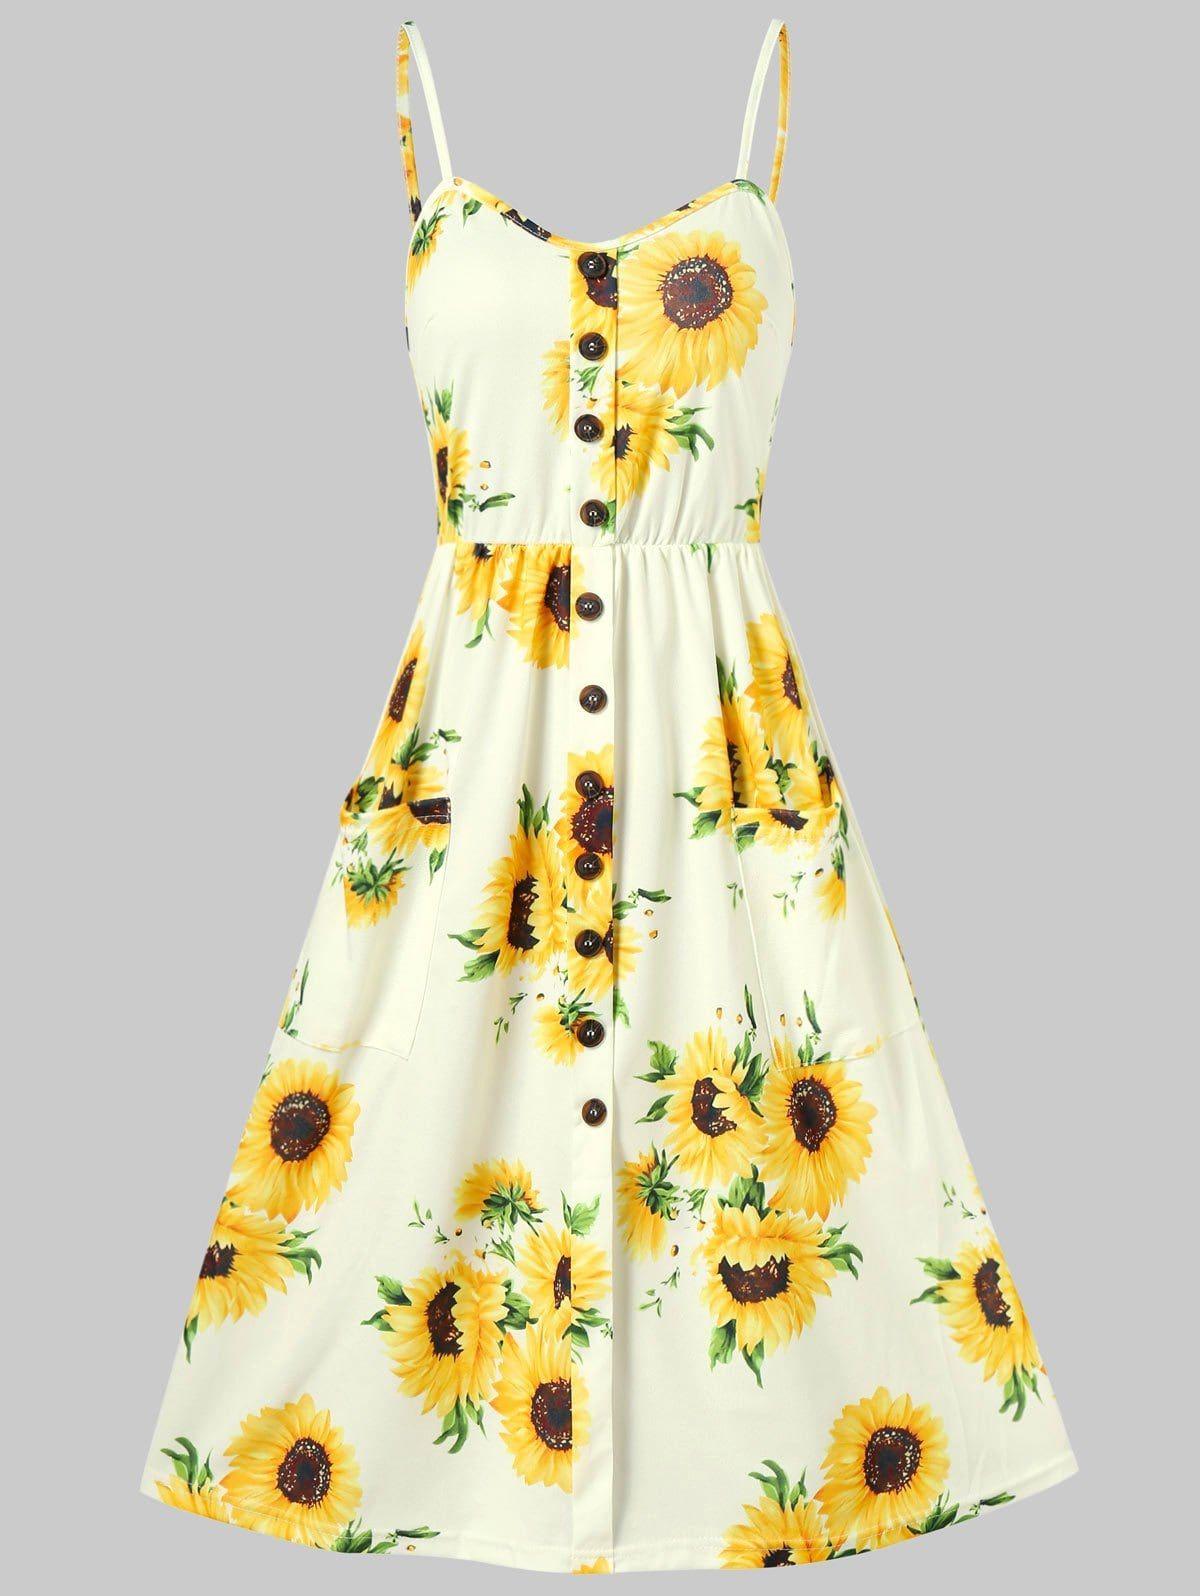 Sunflower Print Button Up A Line Cami Dress Cami Dress Printed Mini Dress Fashion [ 1596 x 1200 Pixel ]